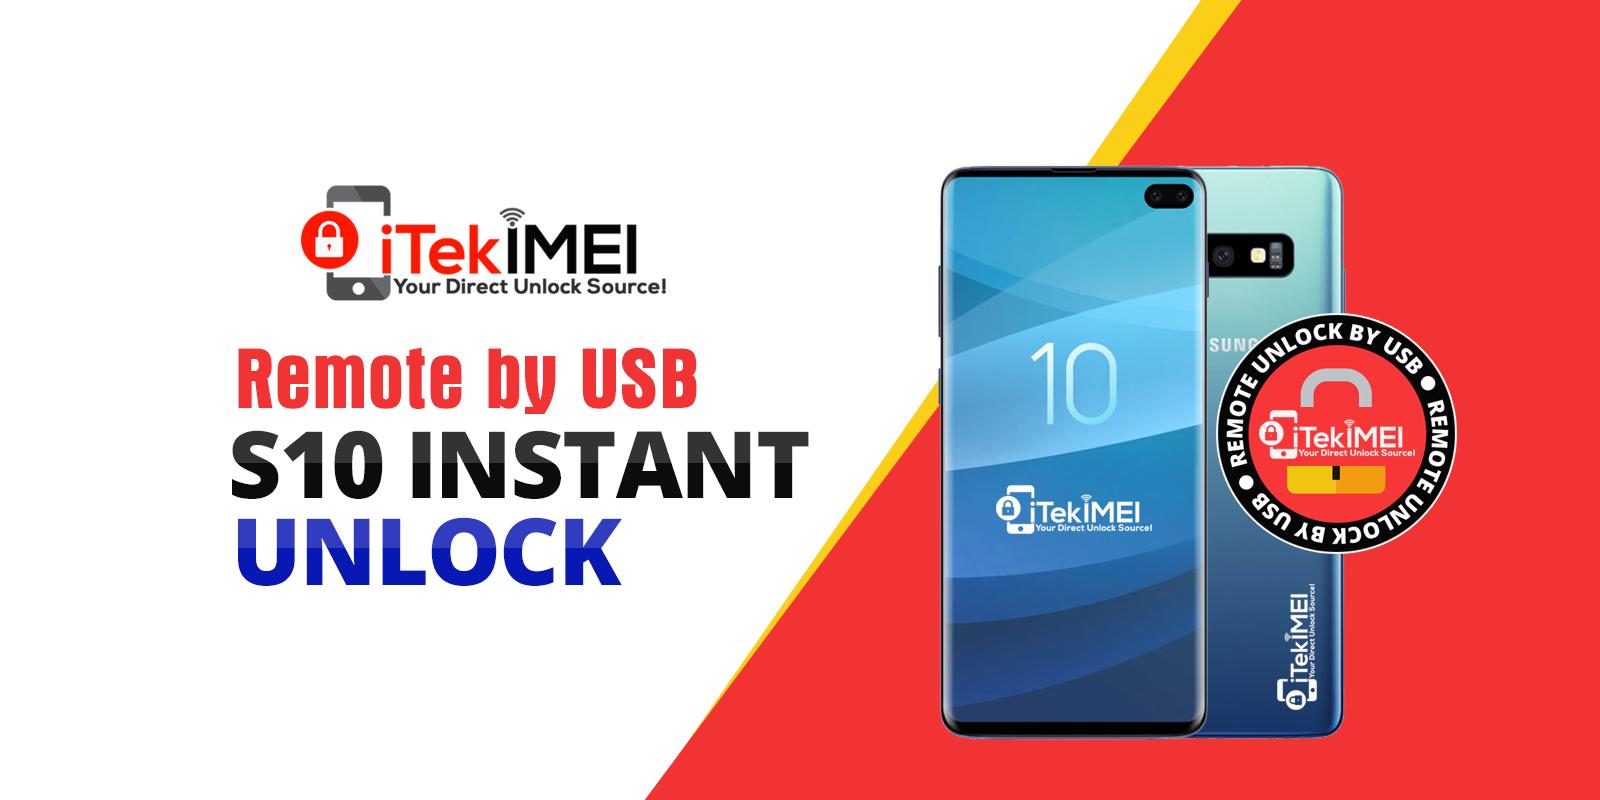 iTek IMEI - USB Based Unlocks, Google Lock Removal, Sprint